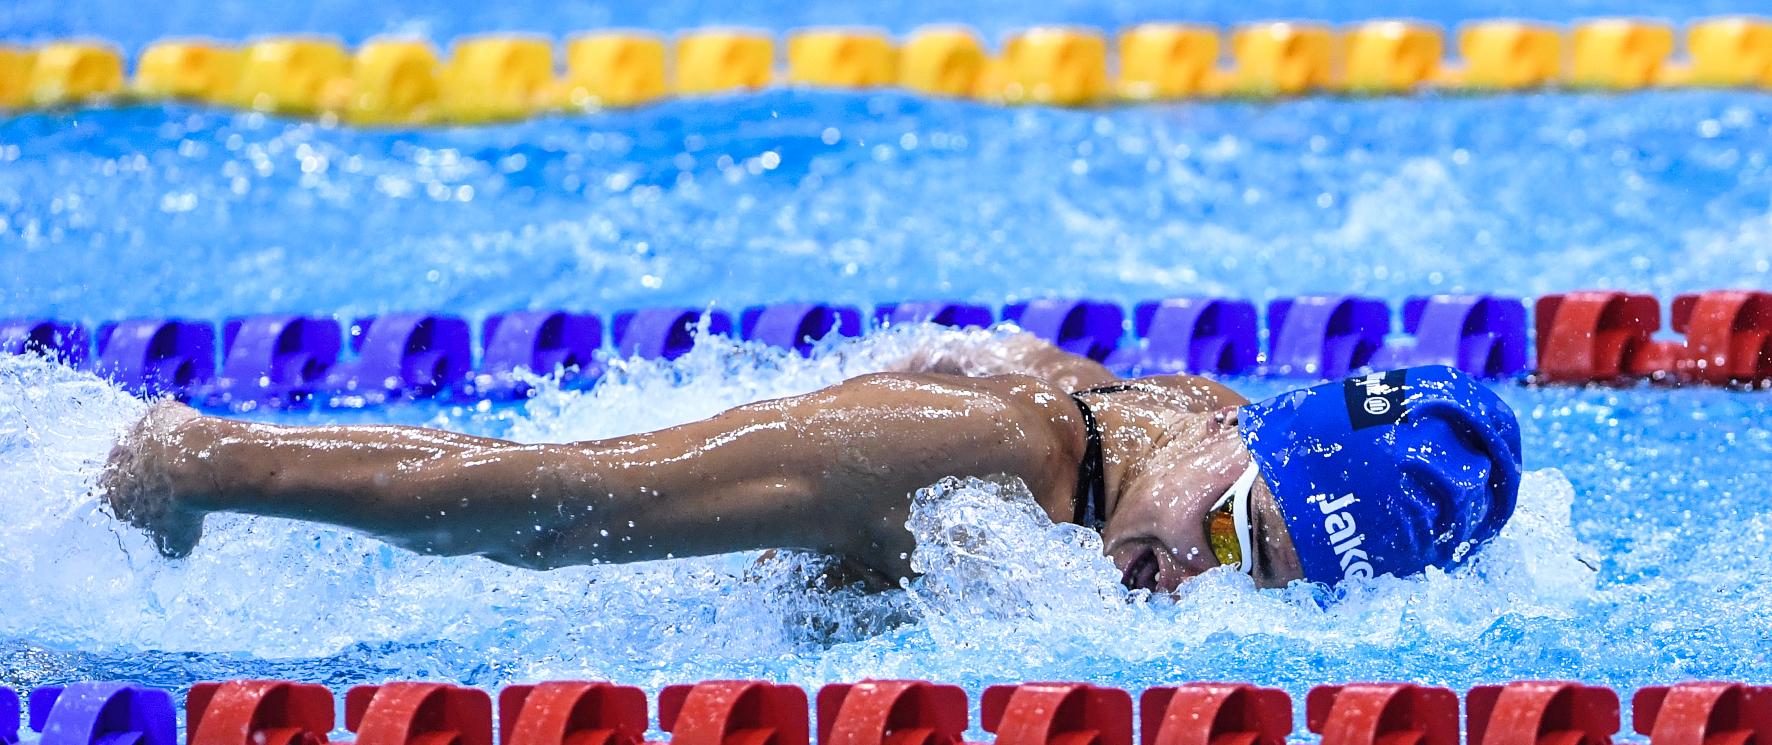 Ghiretti Londra nei 50farfalla ai Mondiali Paraswimming